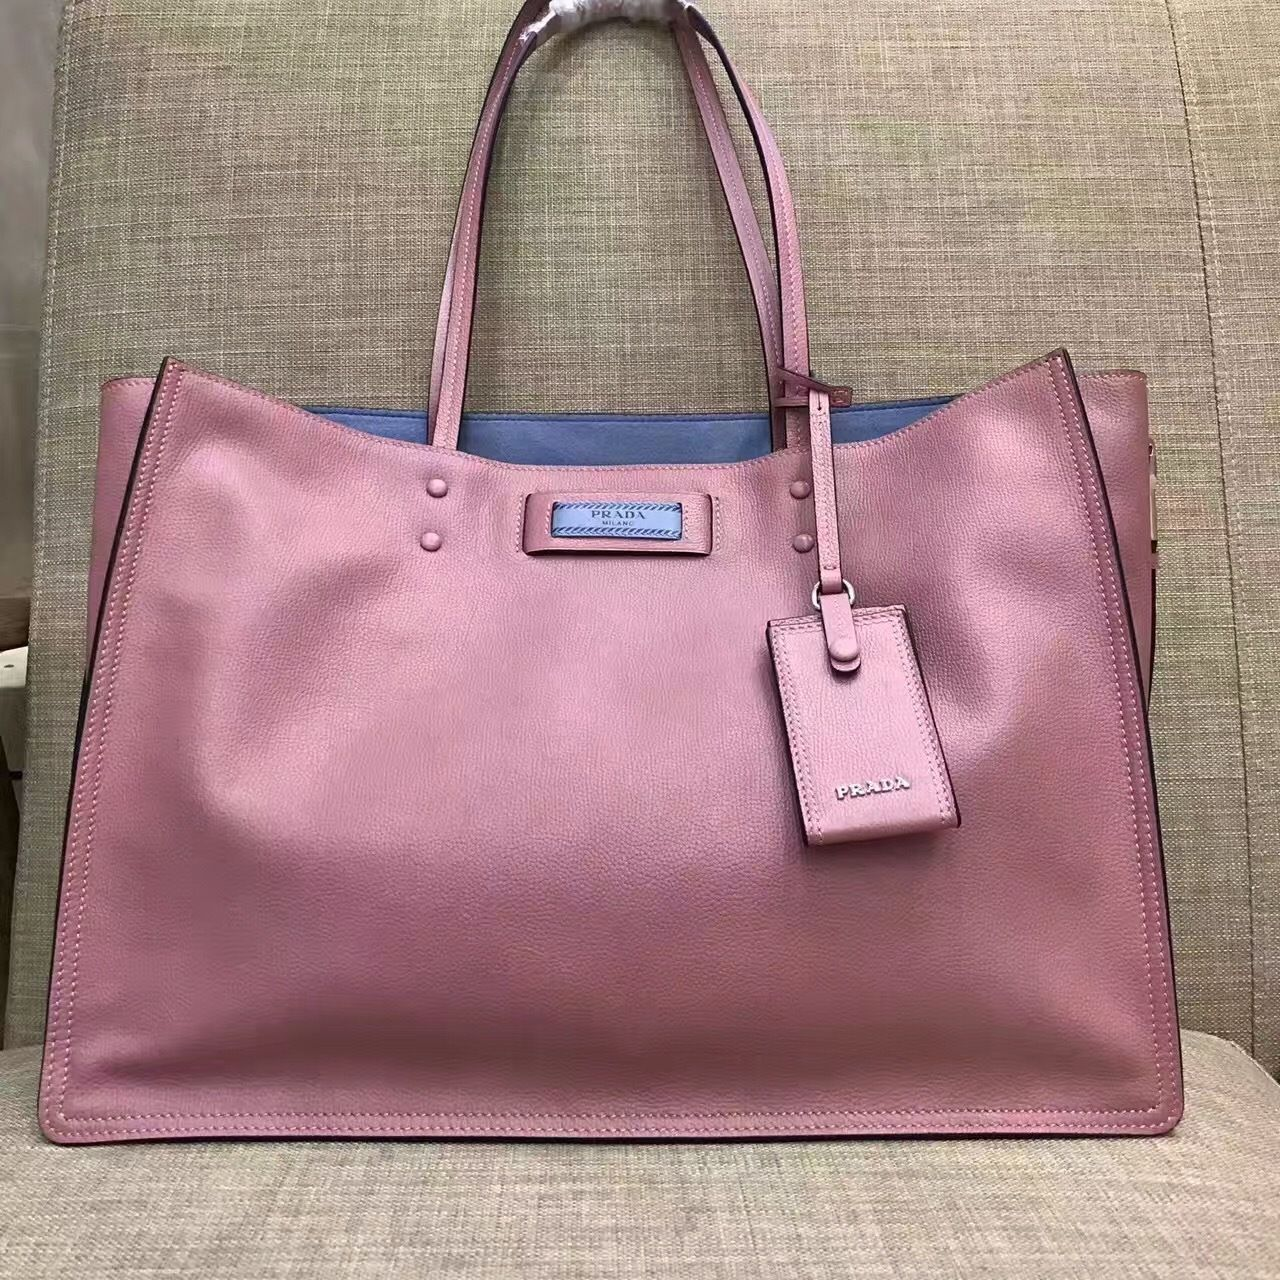 c013edc5e92d Prada tote bag lotus / astral blue in 2018 | [GROUP BOARD] Handbag ...